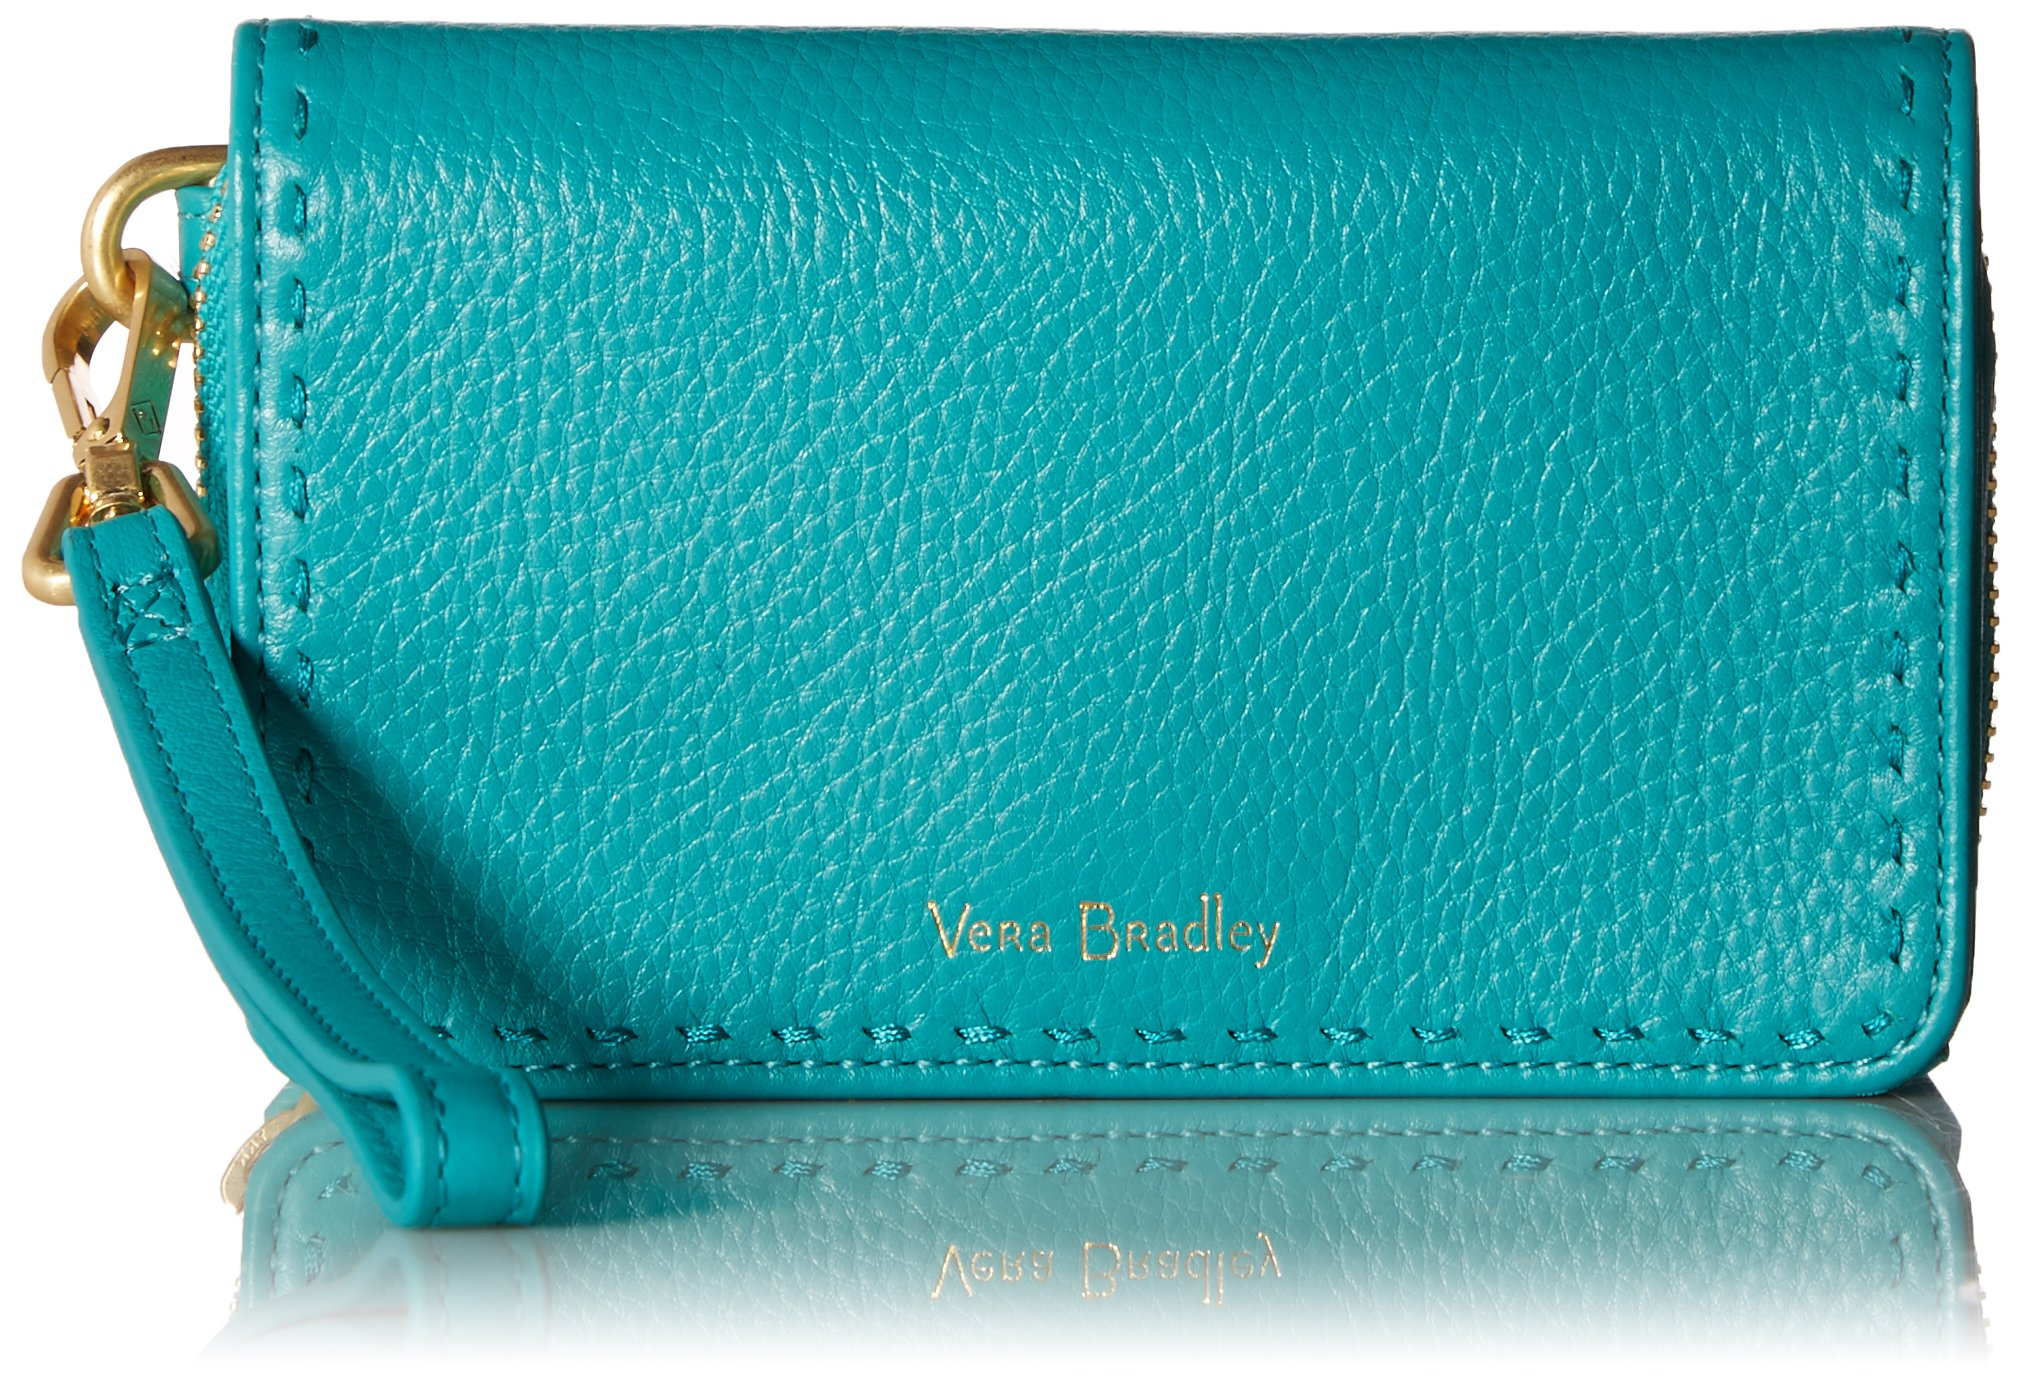 Vera Bradley Rfid Mallory Smartphone Wristlet, Turquoise Sea